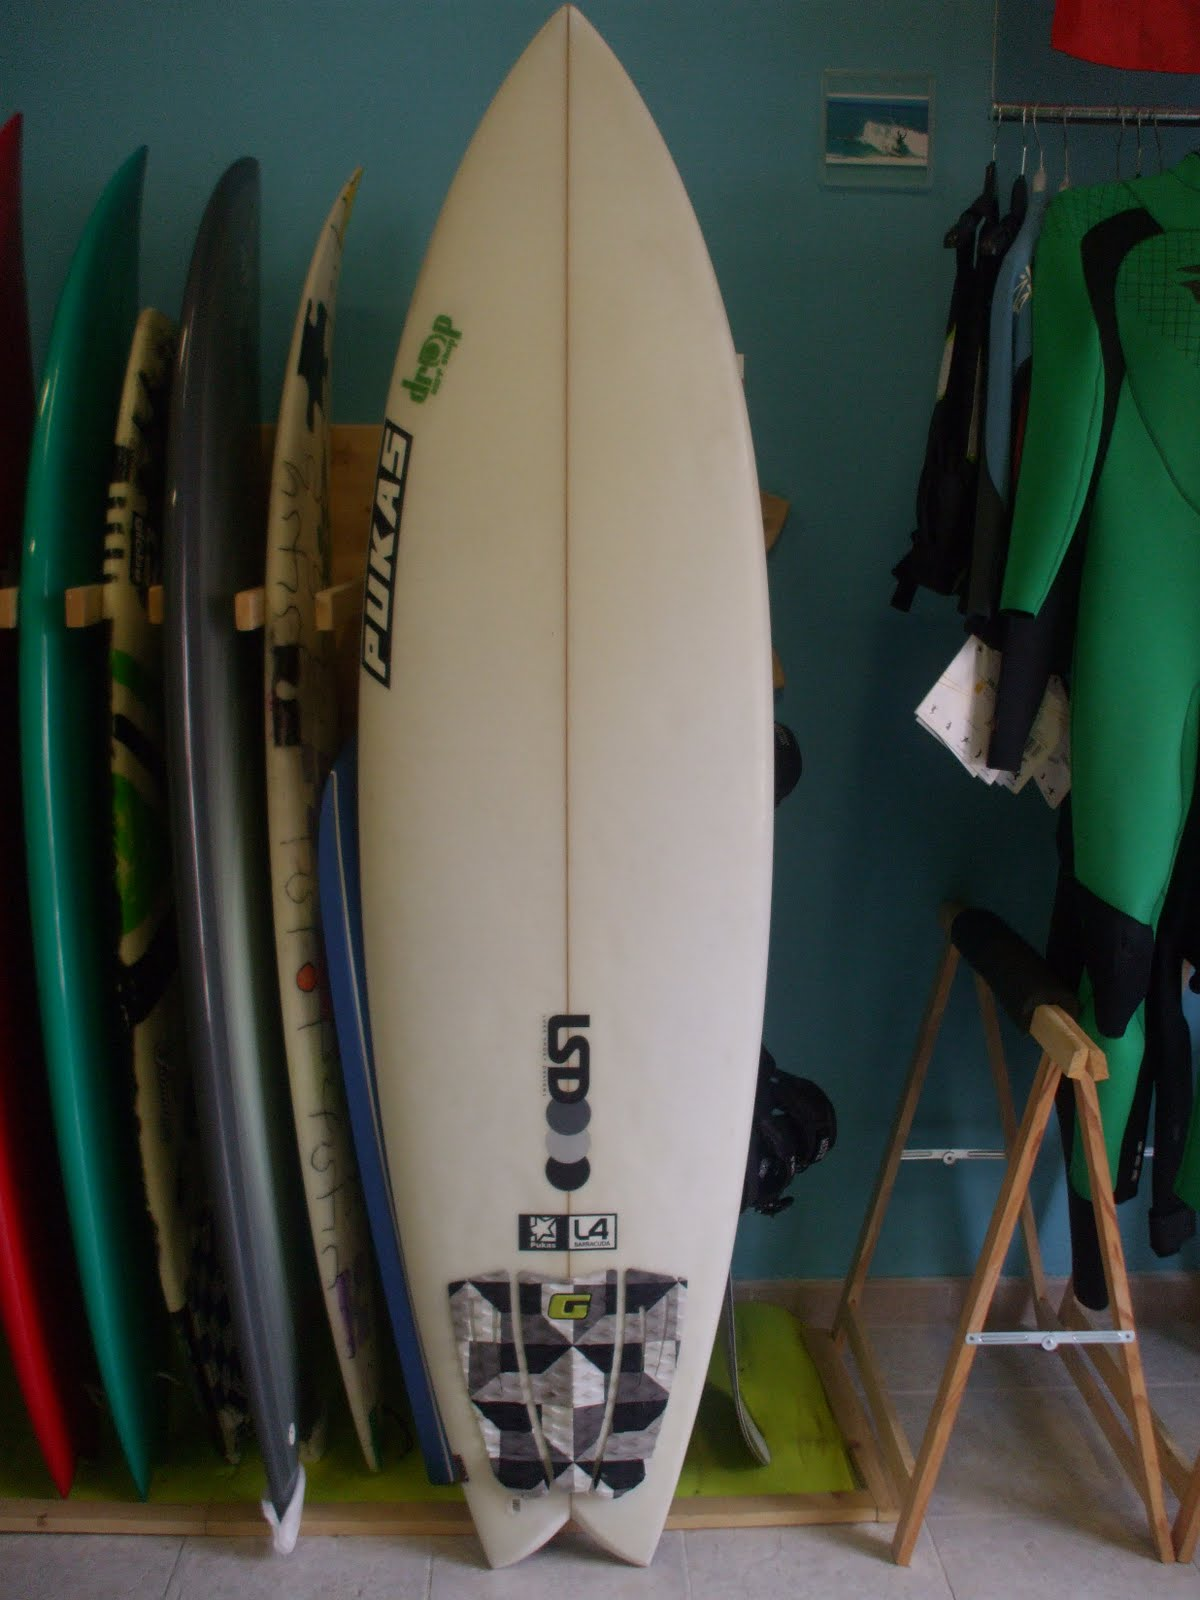 Brindisi surf club tavole usate in vendita - Tavole da ponteggio usate ...